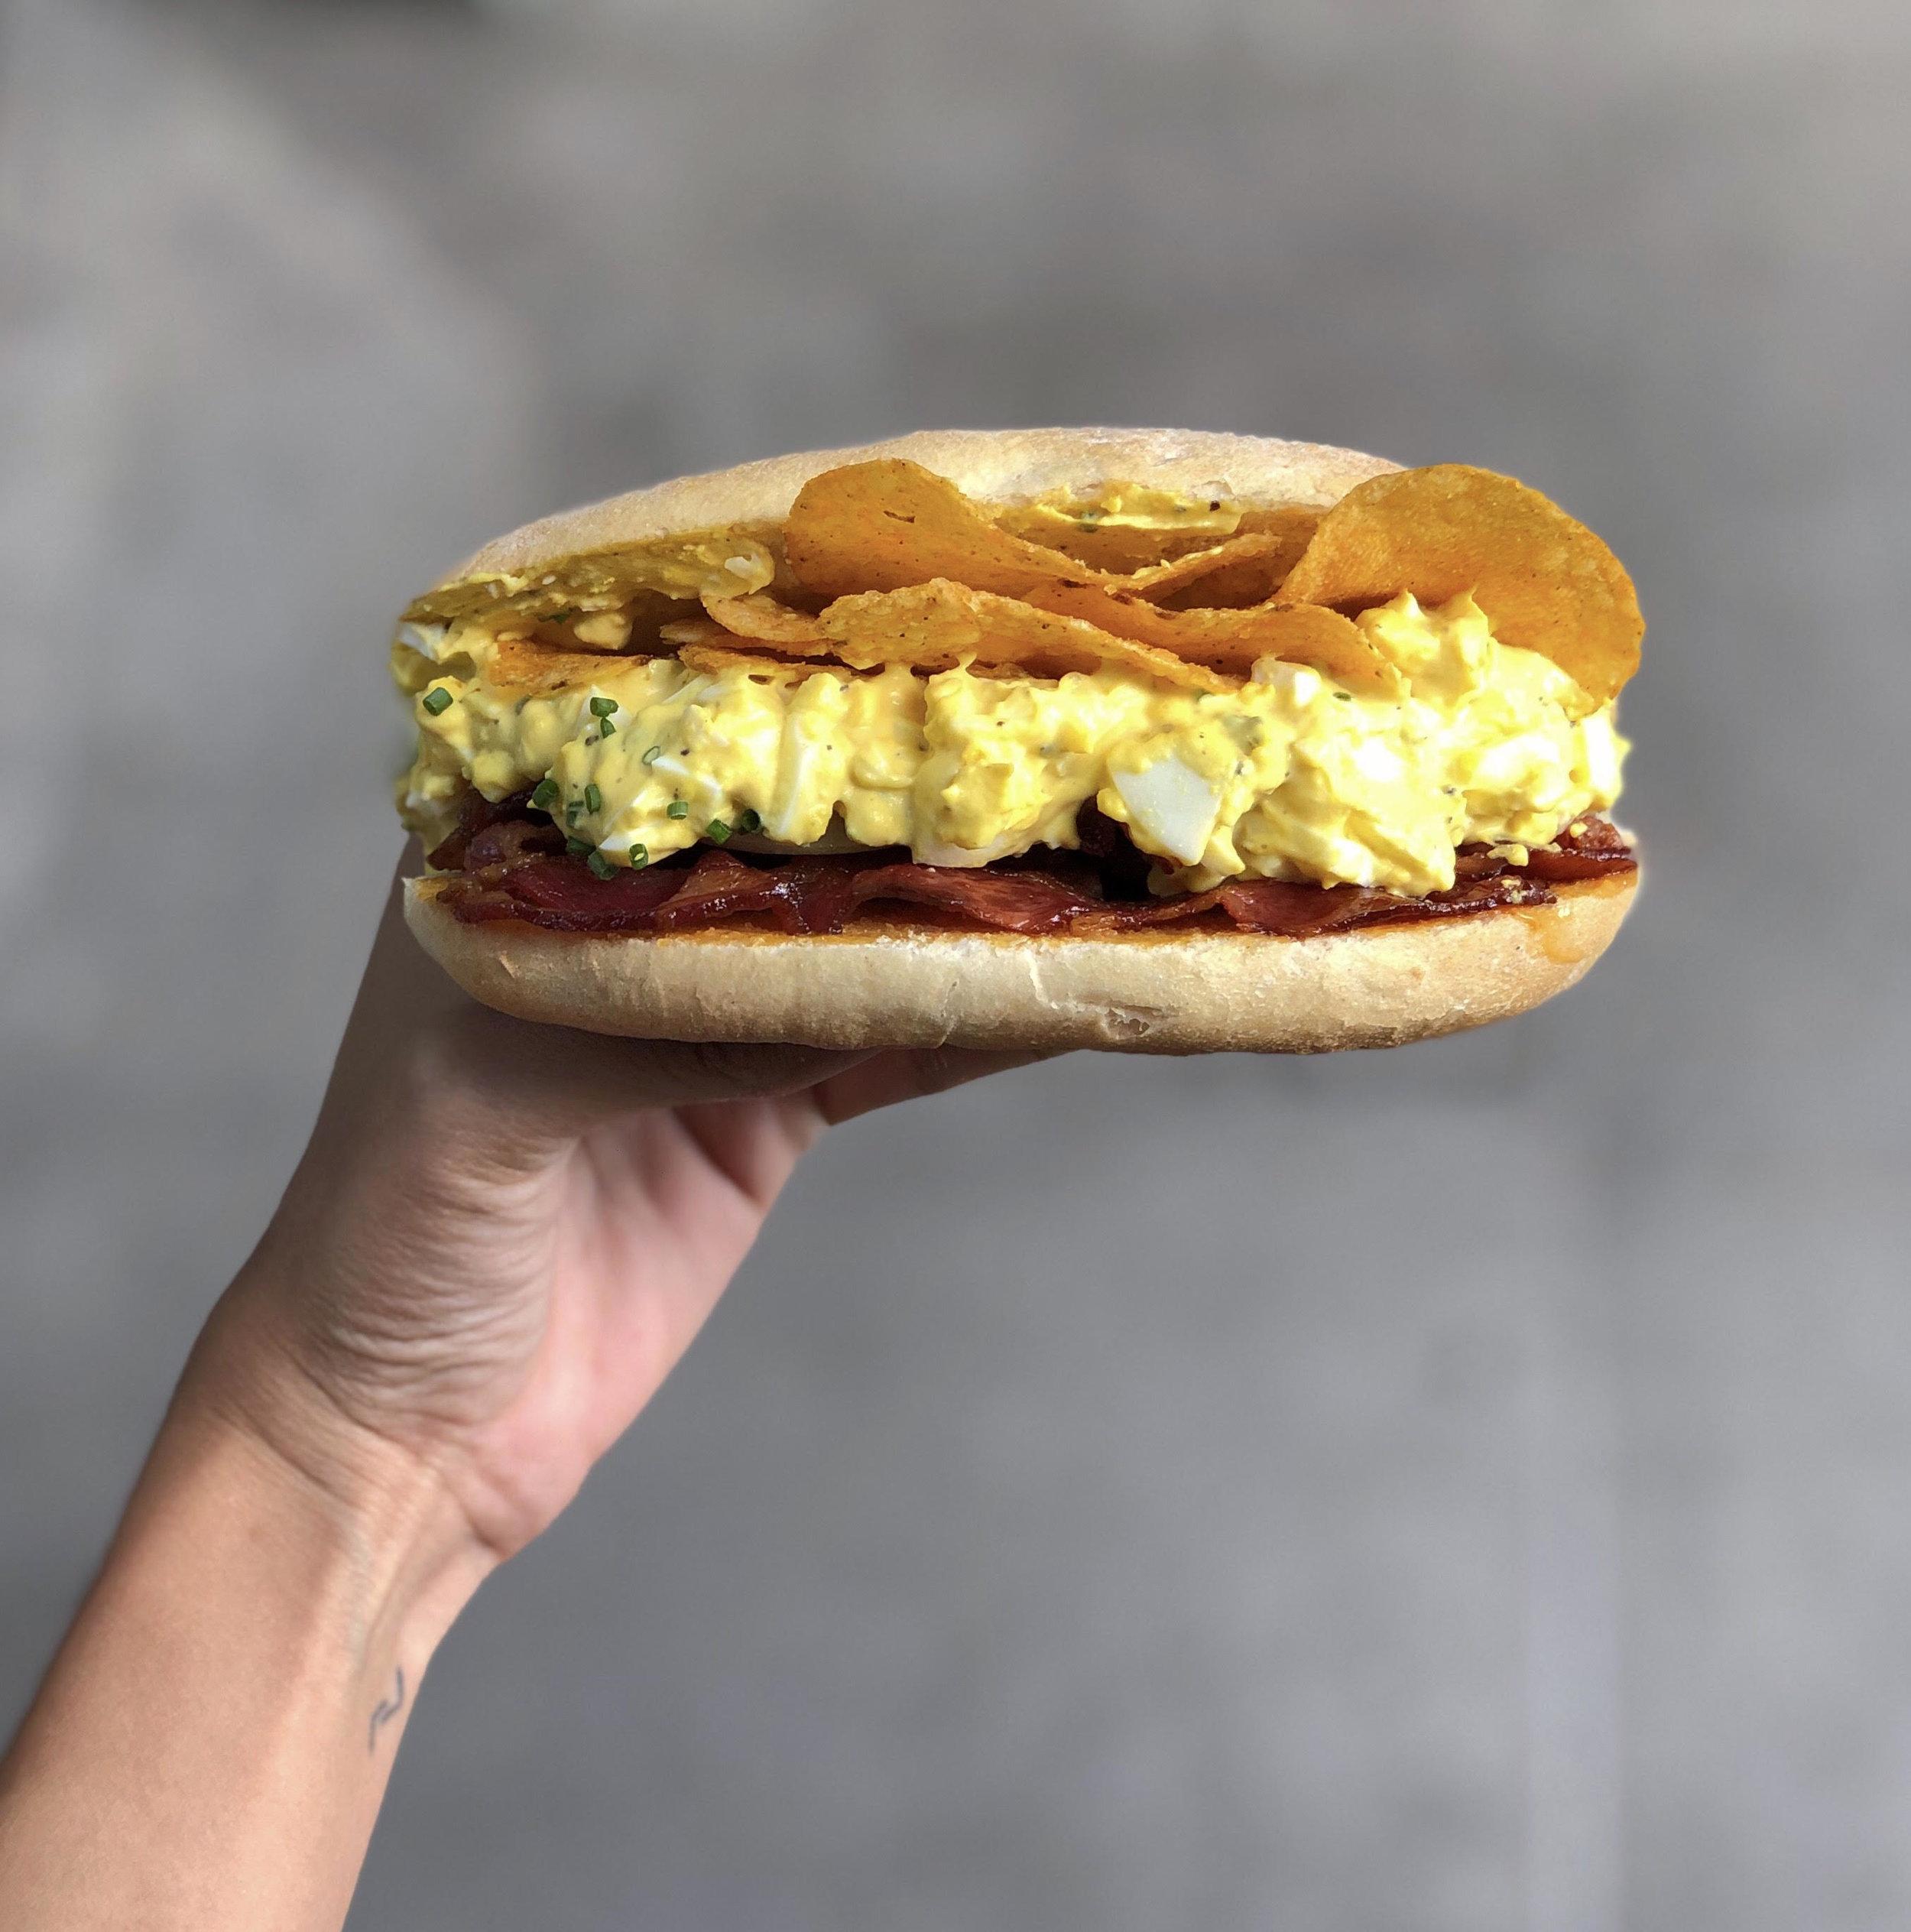 07152019_entre2panes-sandwich de huevo 02.jpg